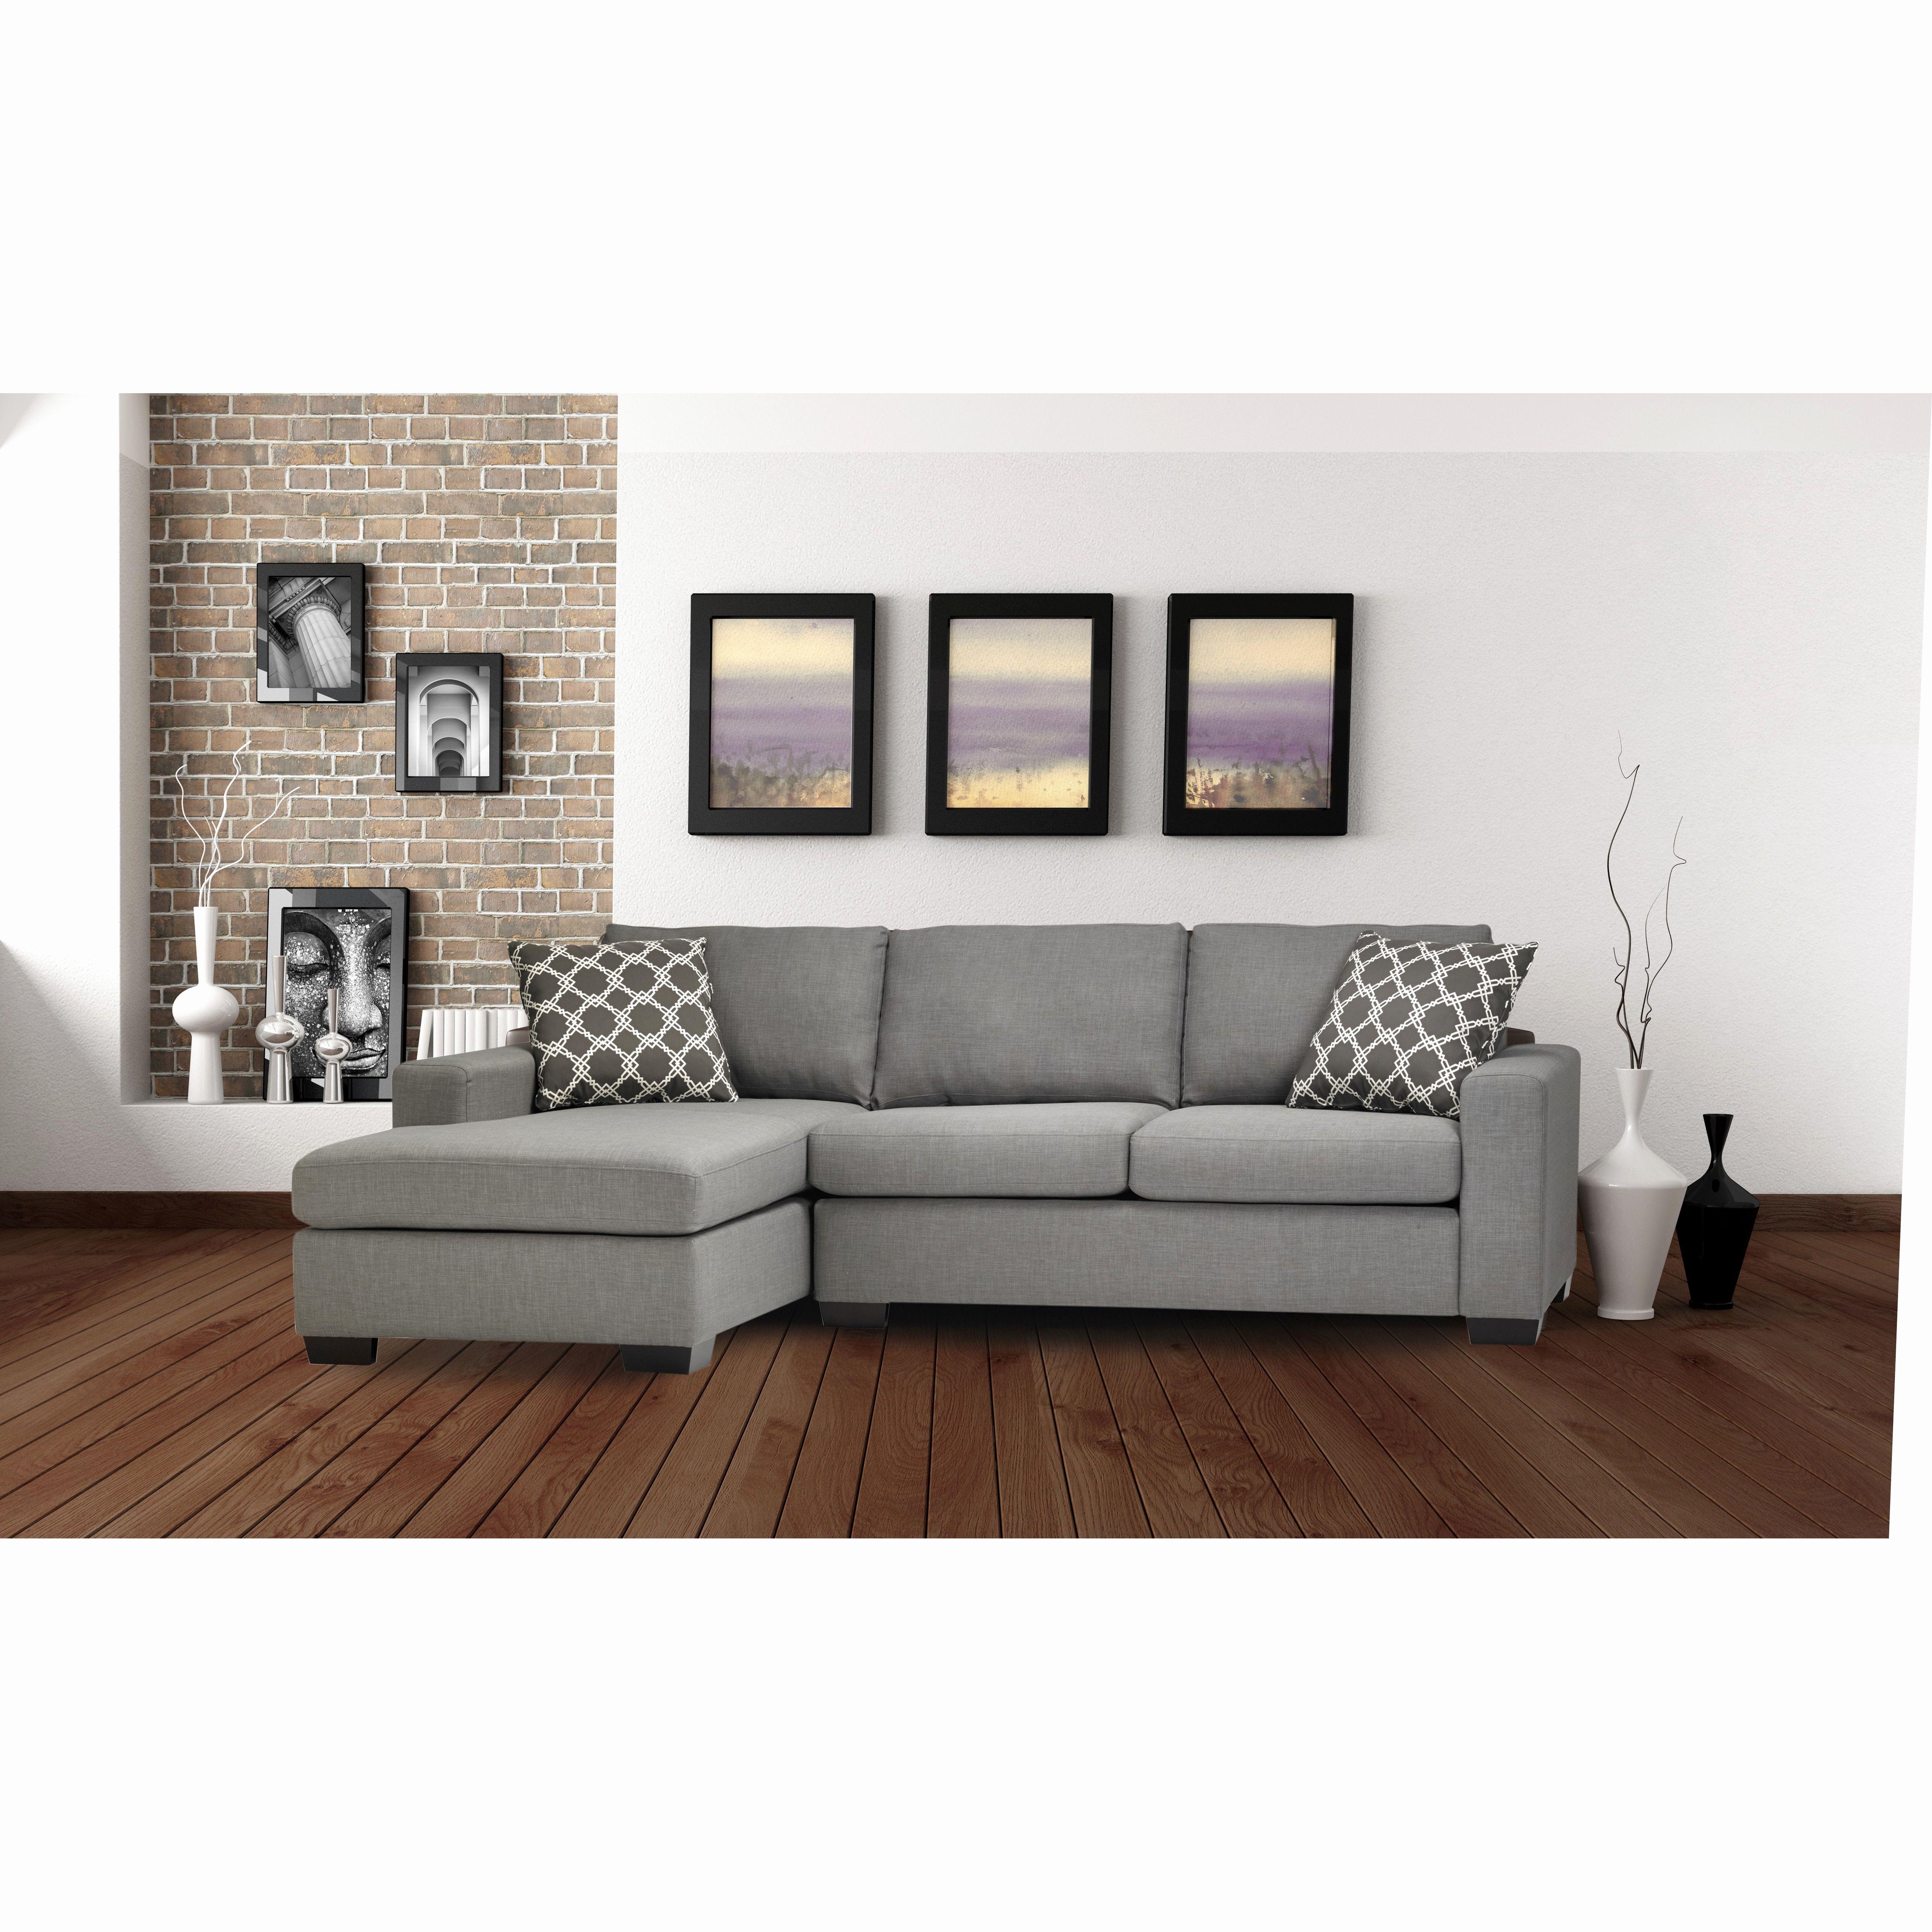 Ideas Fold Out Sectional Sleeper sofa Image sofa appealing